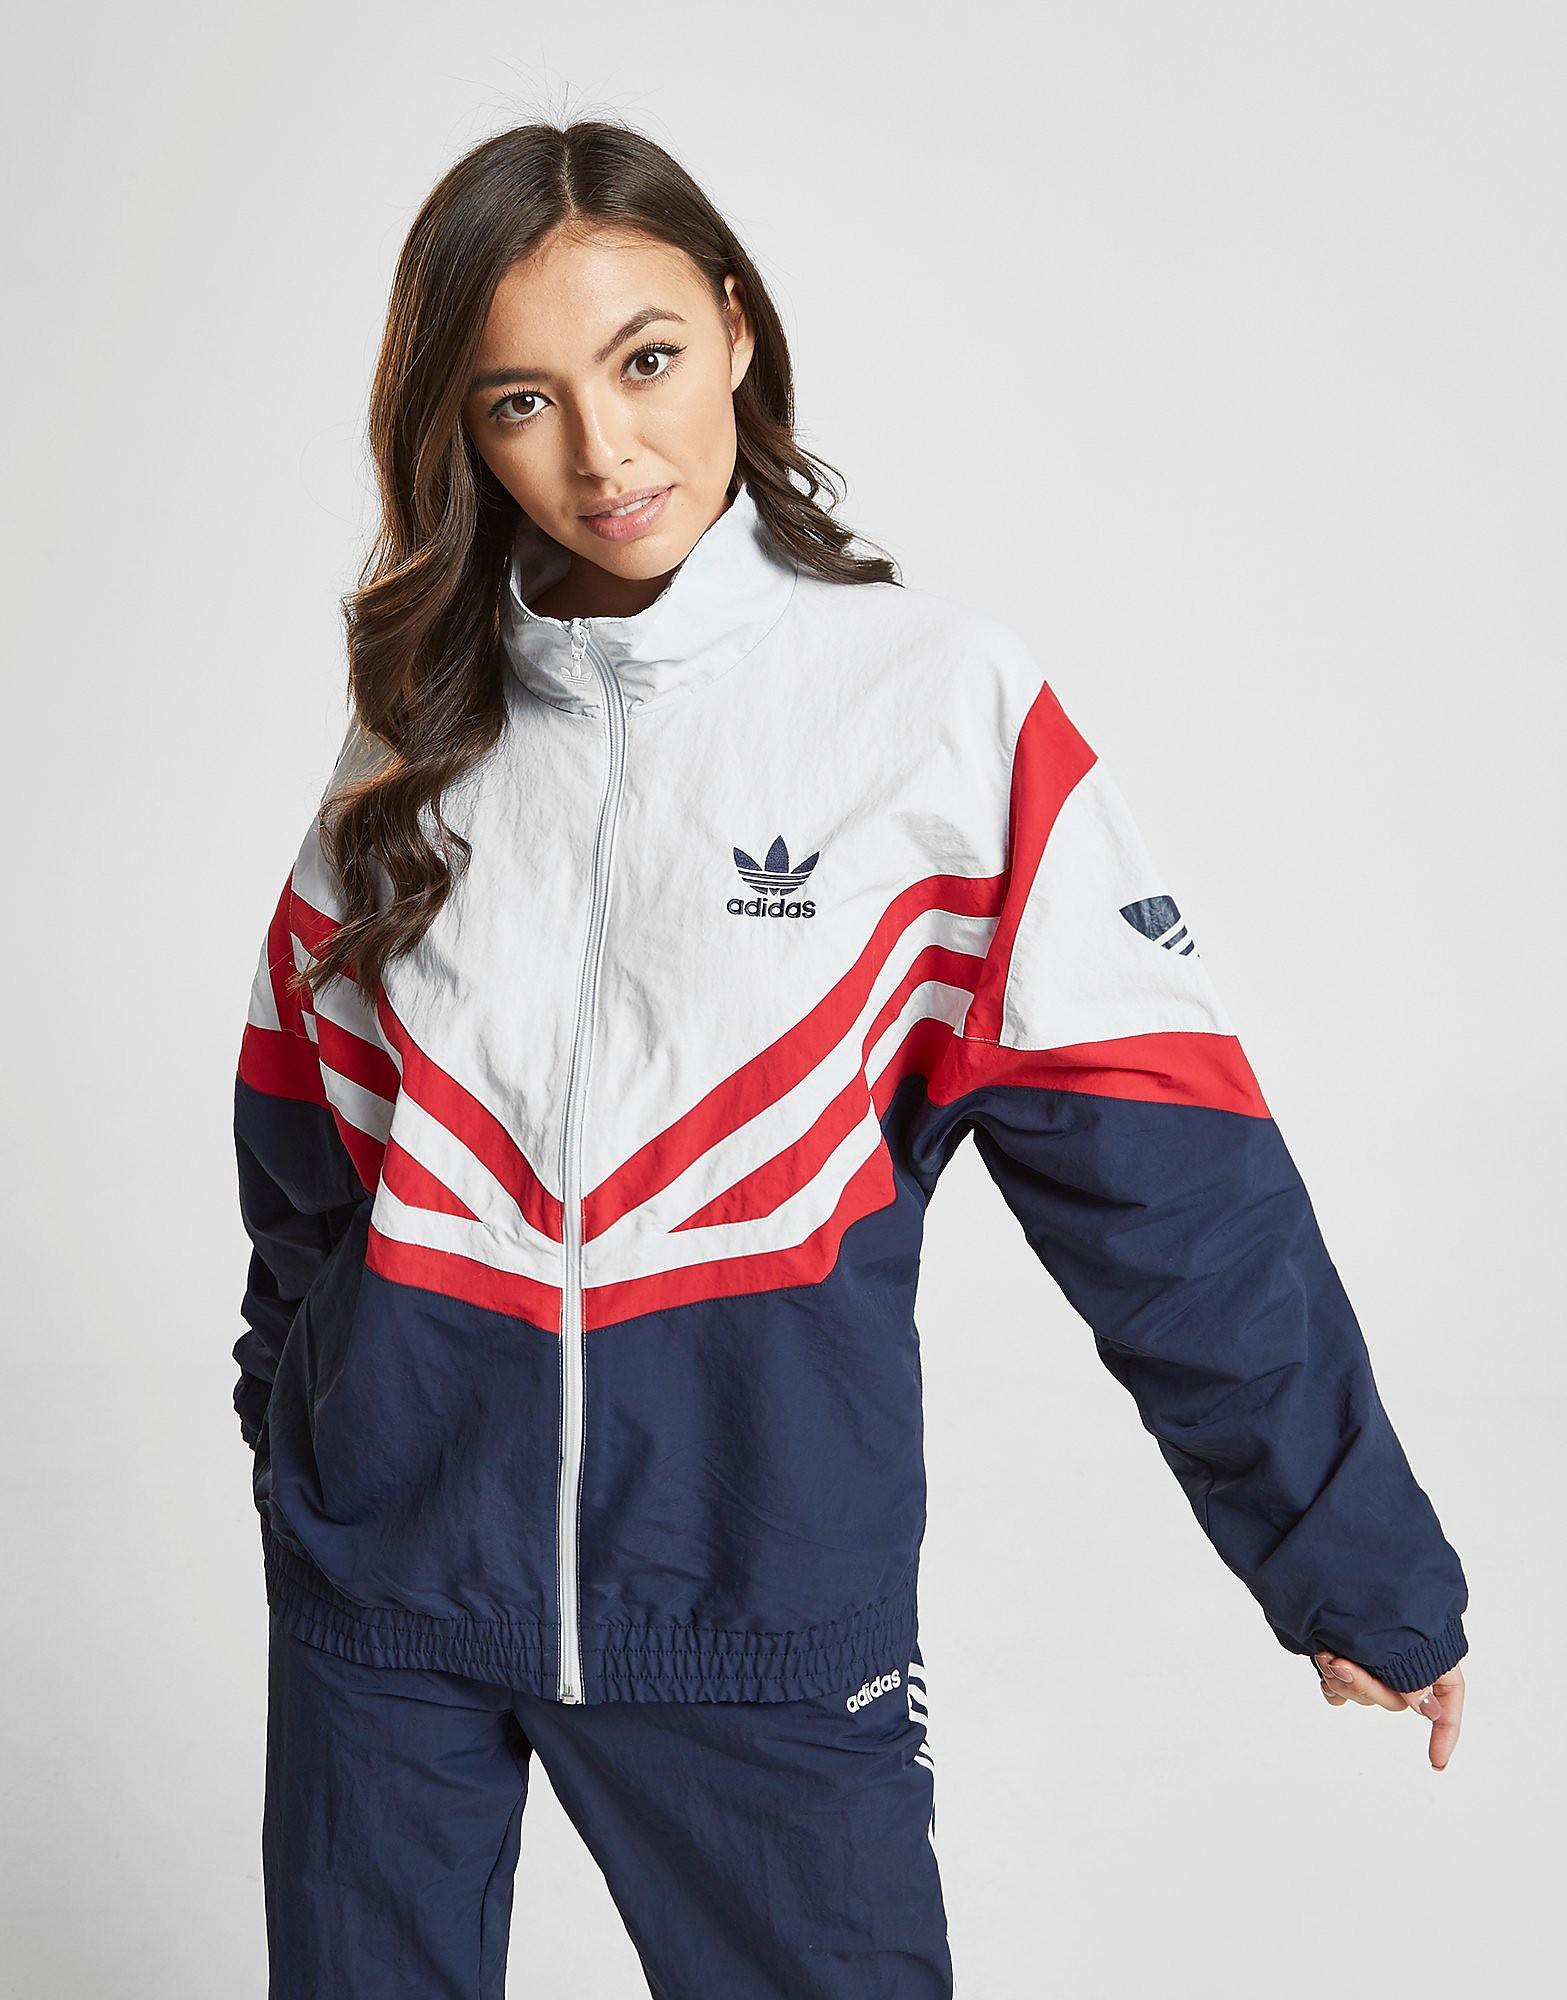 Adidas Originals Track Tops Women Jd Sports